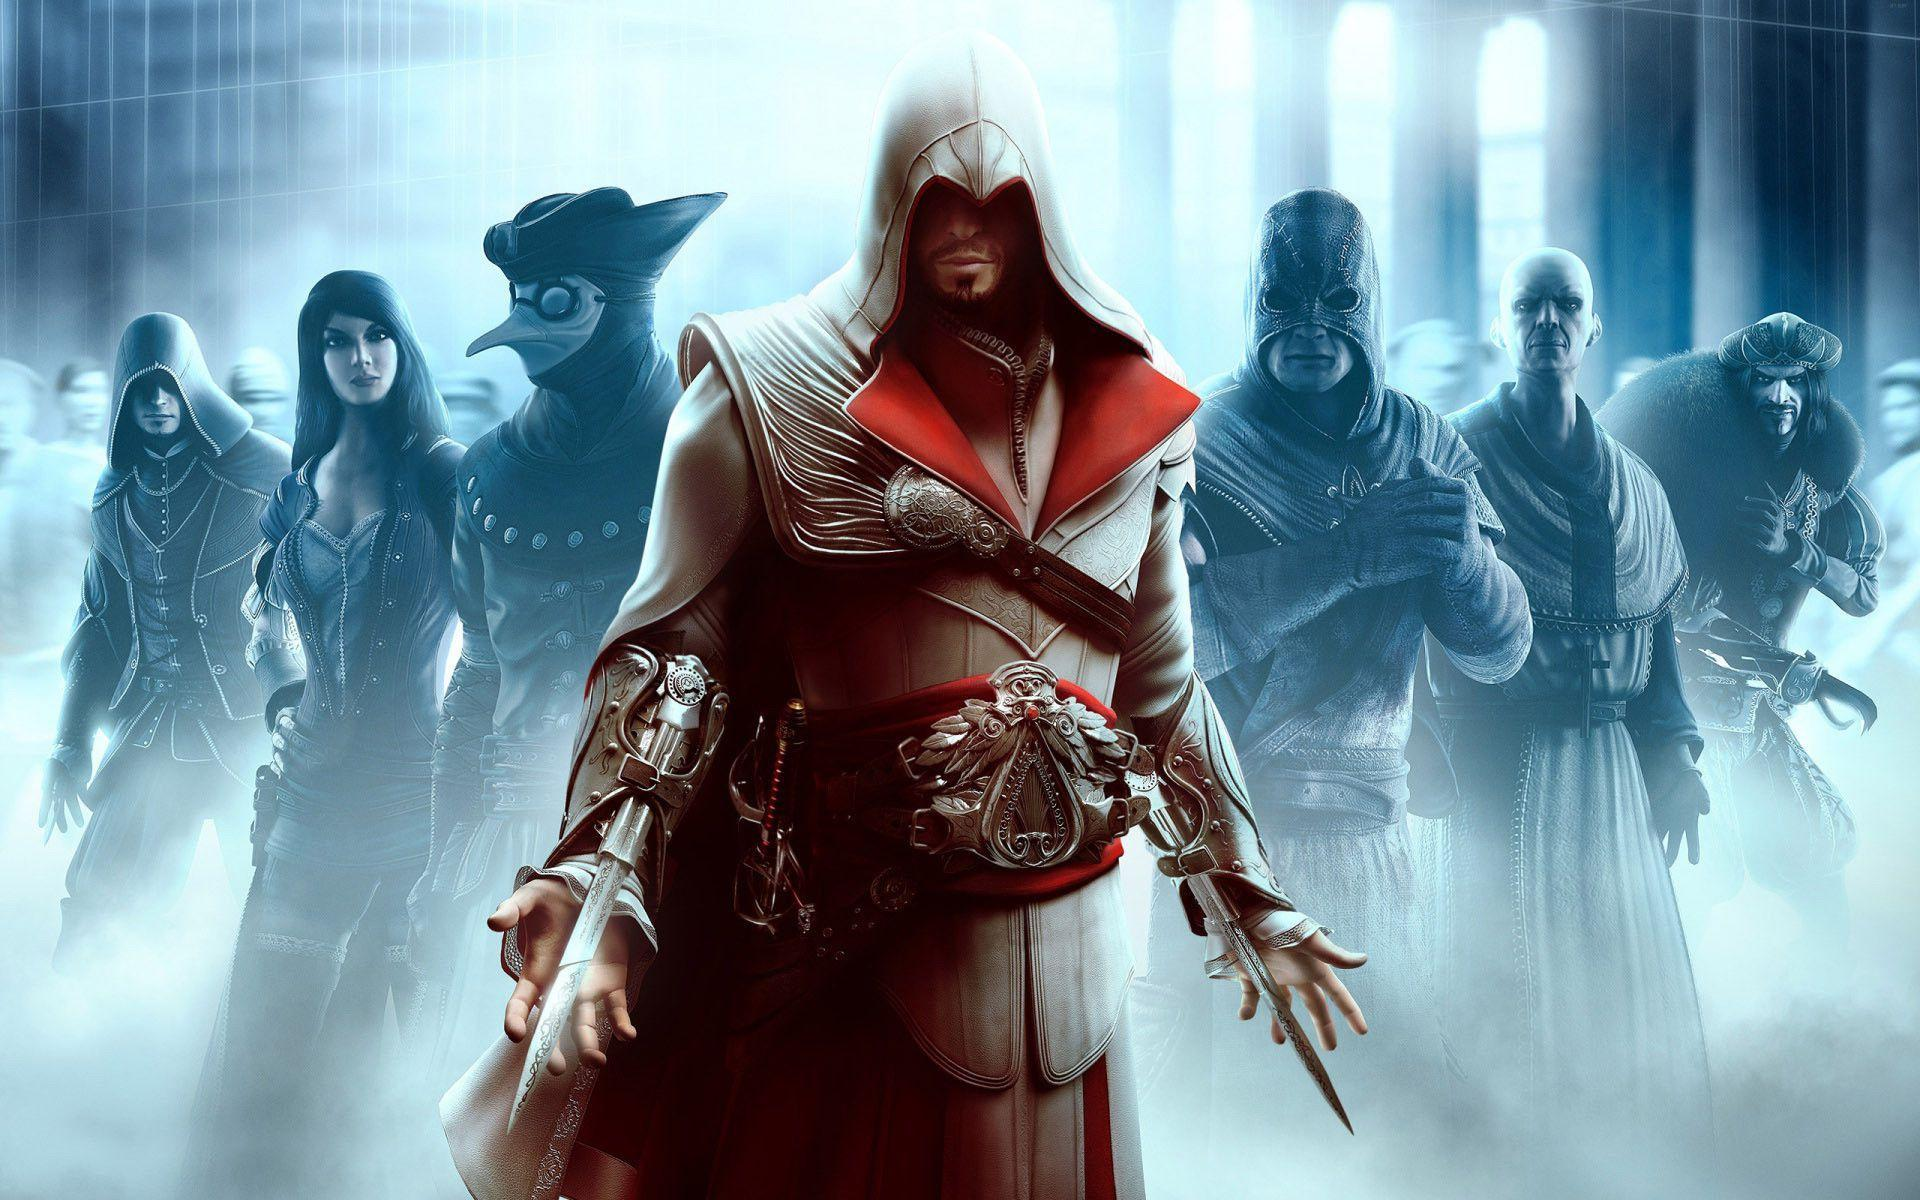 assassin's creed: brotherhood wallpapers - wallpaper cave